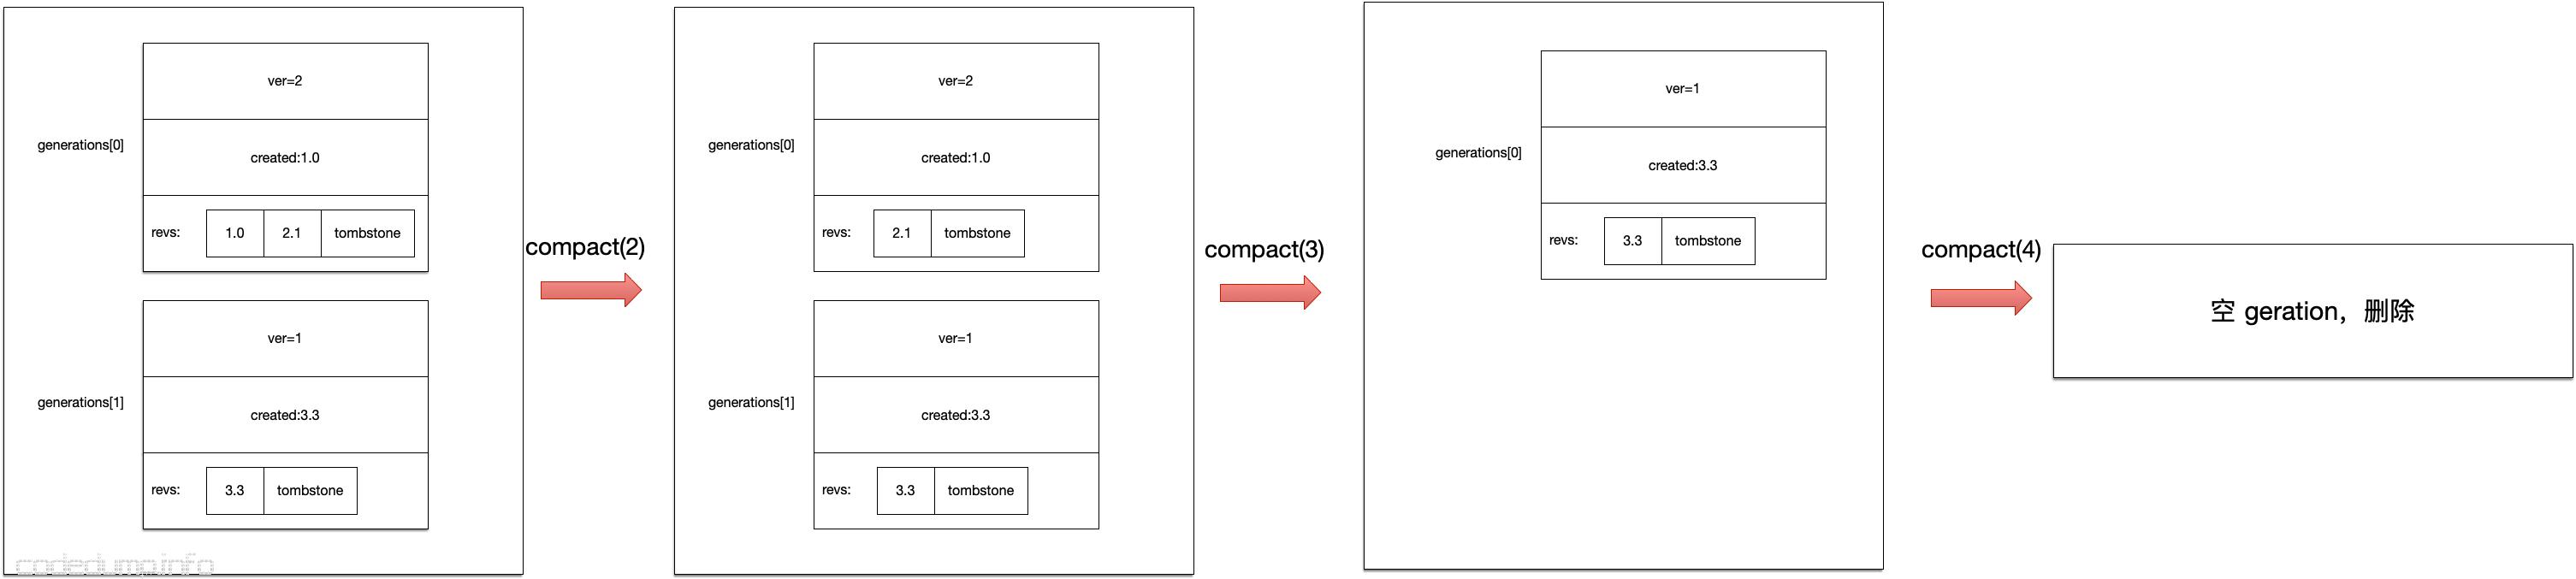 etcd generation_compact